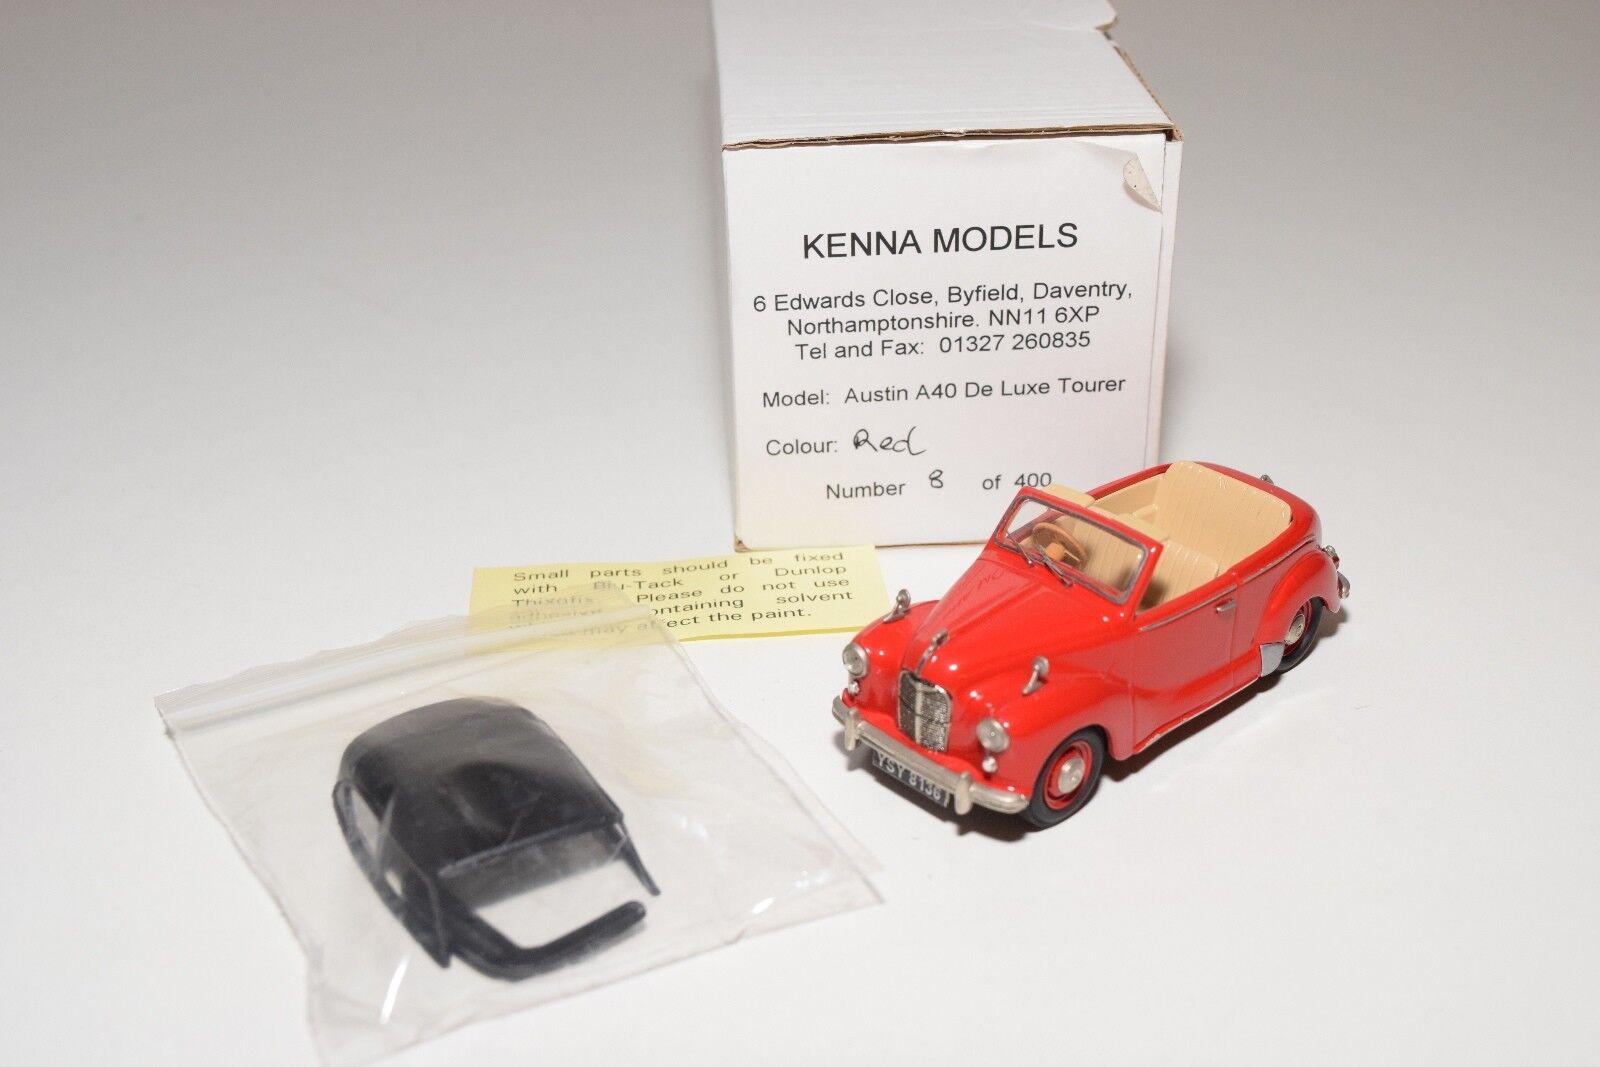 KENNA MODELS AUSTIN A40 DE LUXE TOURER RED MINT BOXED 8 400 RARE